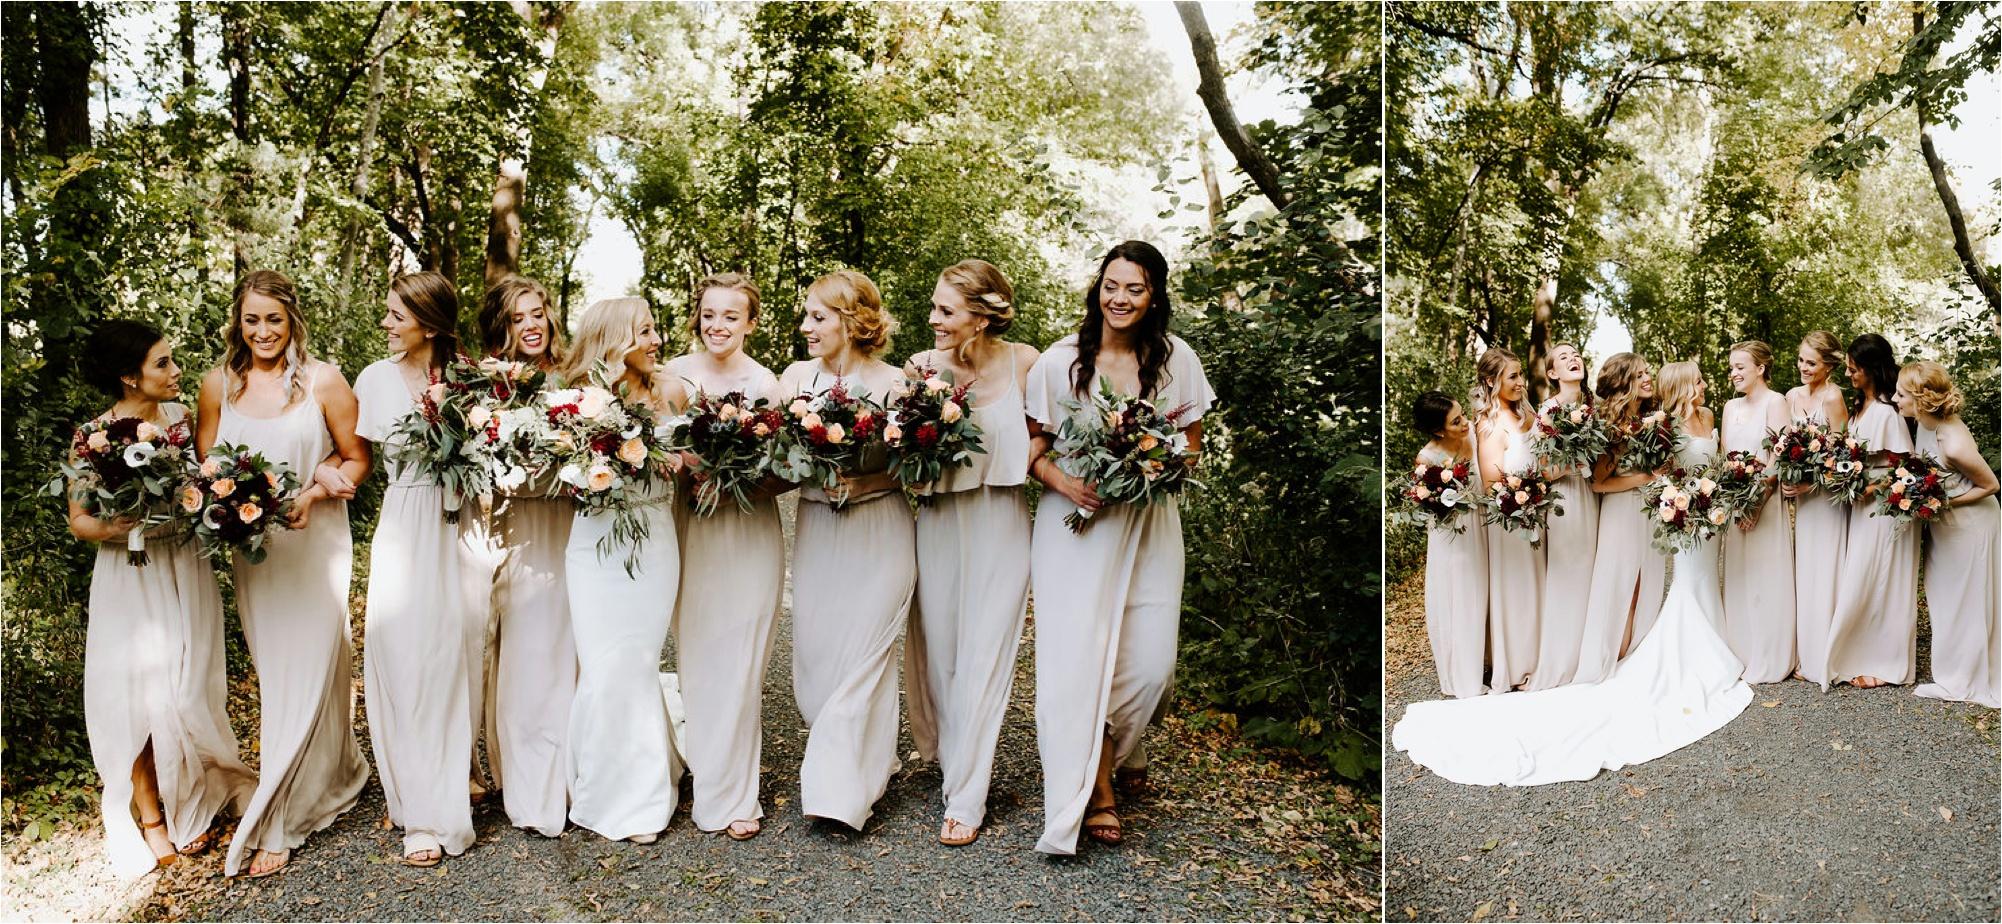 Winehaven Taylor's Falls Fall Wedding Minnesota Photographer_3869.jpg